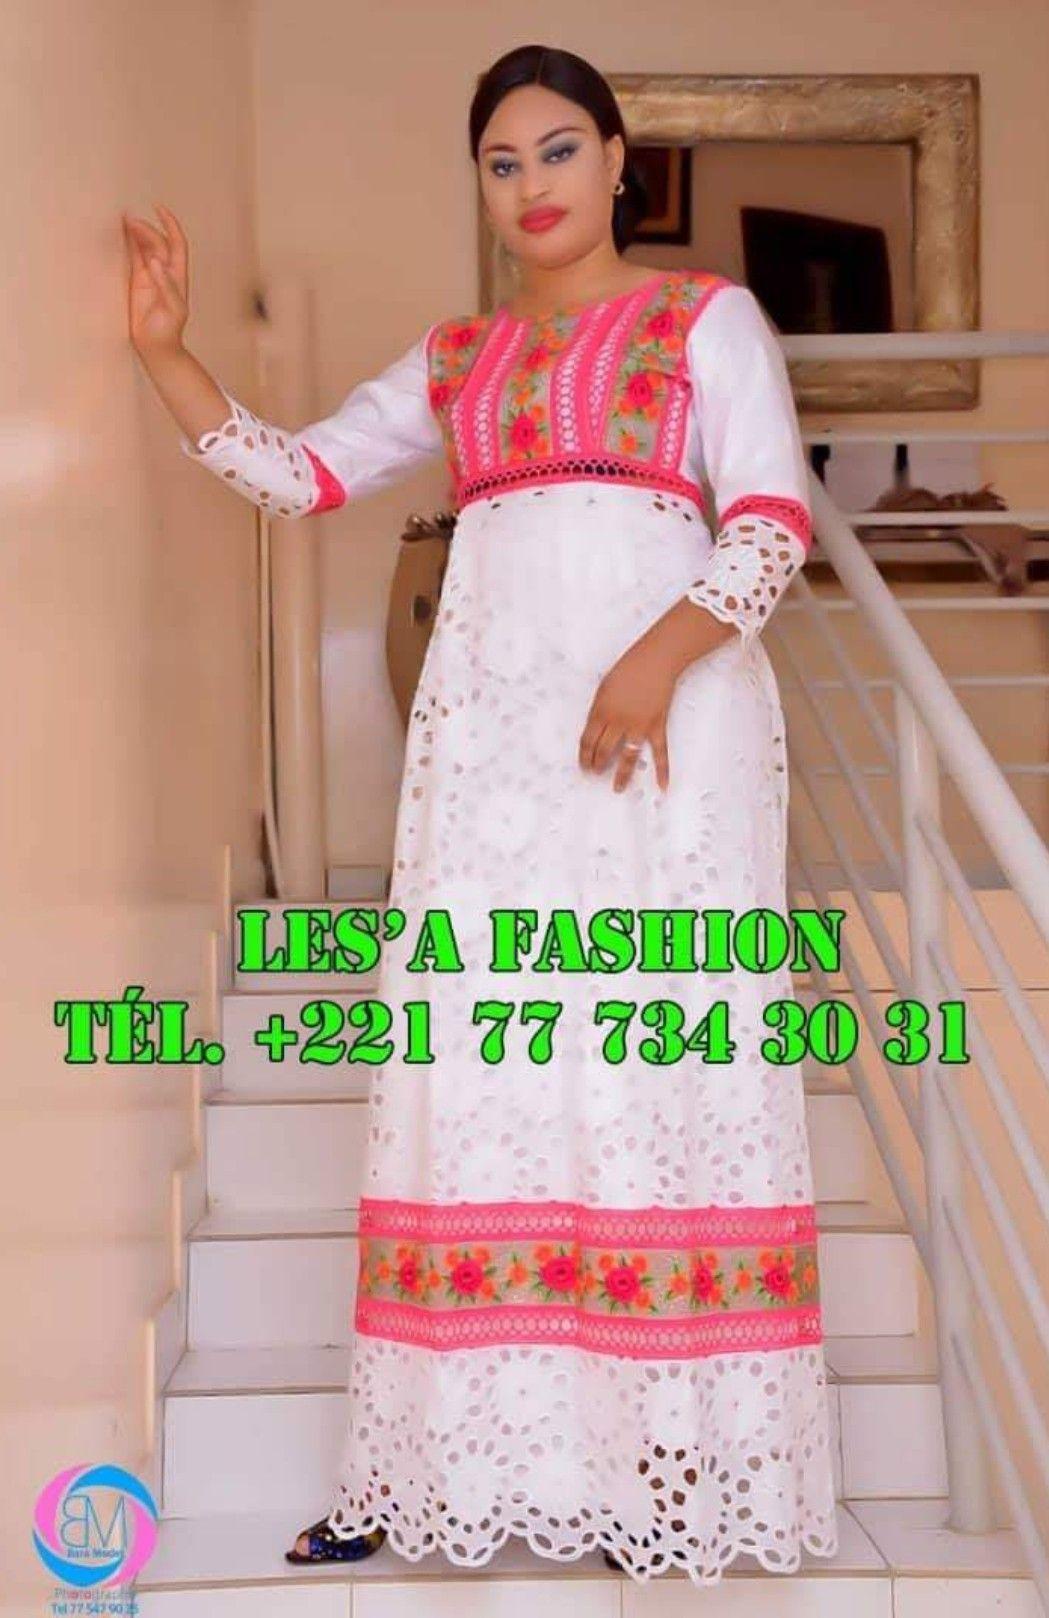 Madame seck   Pinterest mode africaine, Robe africaine, Mode